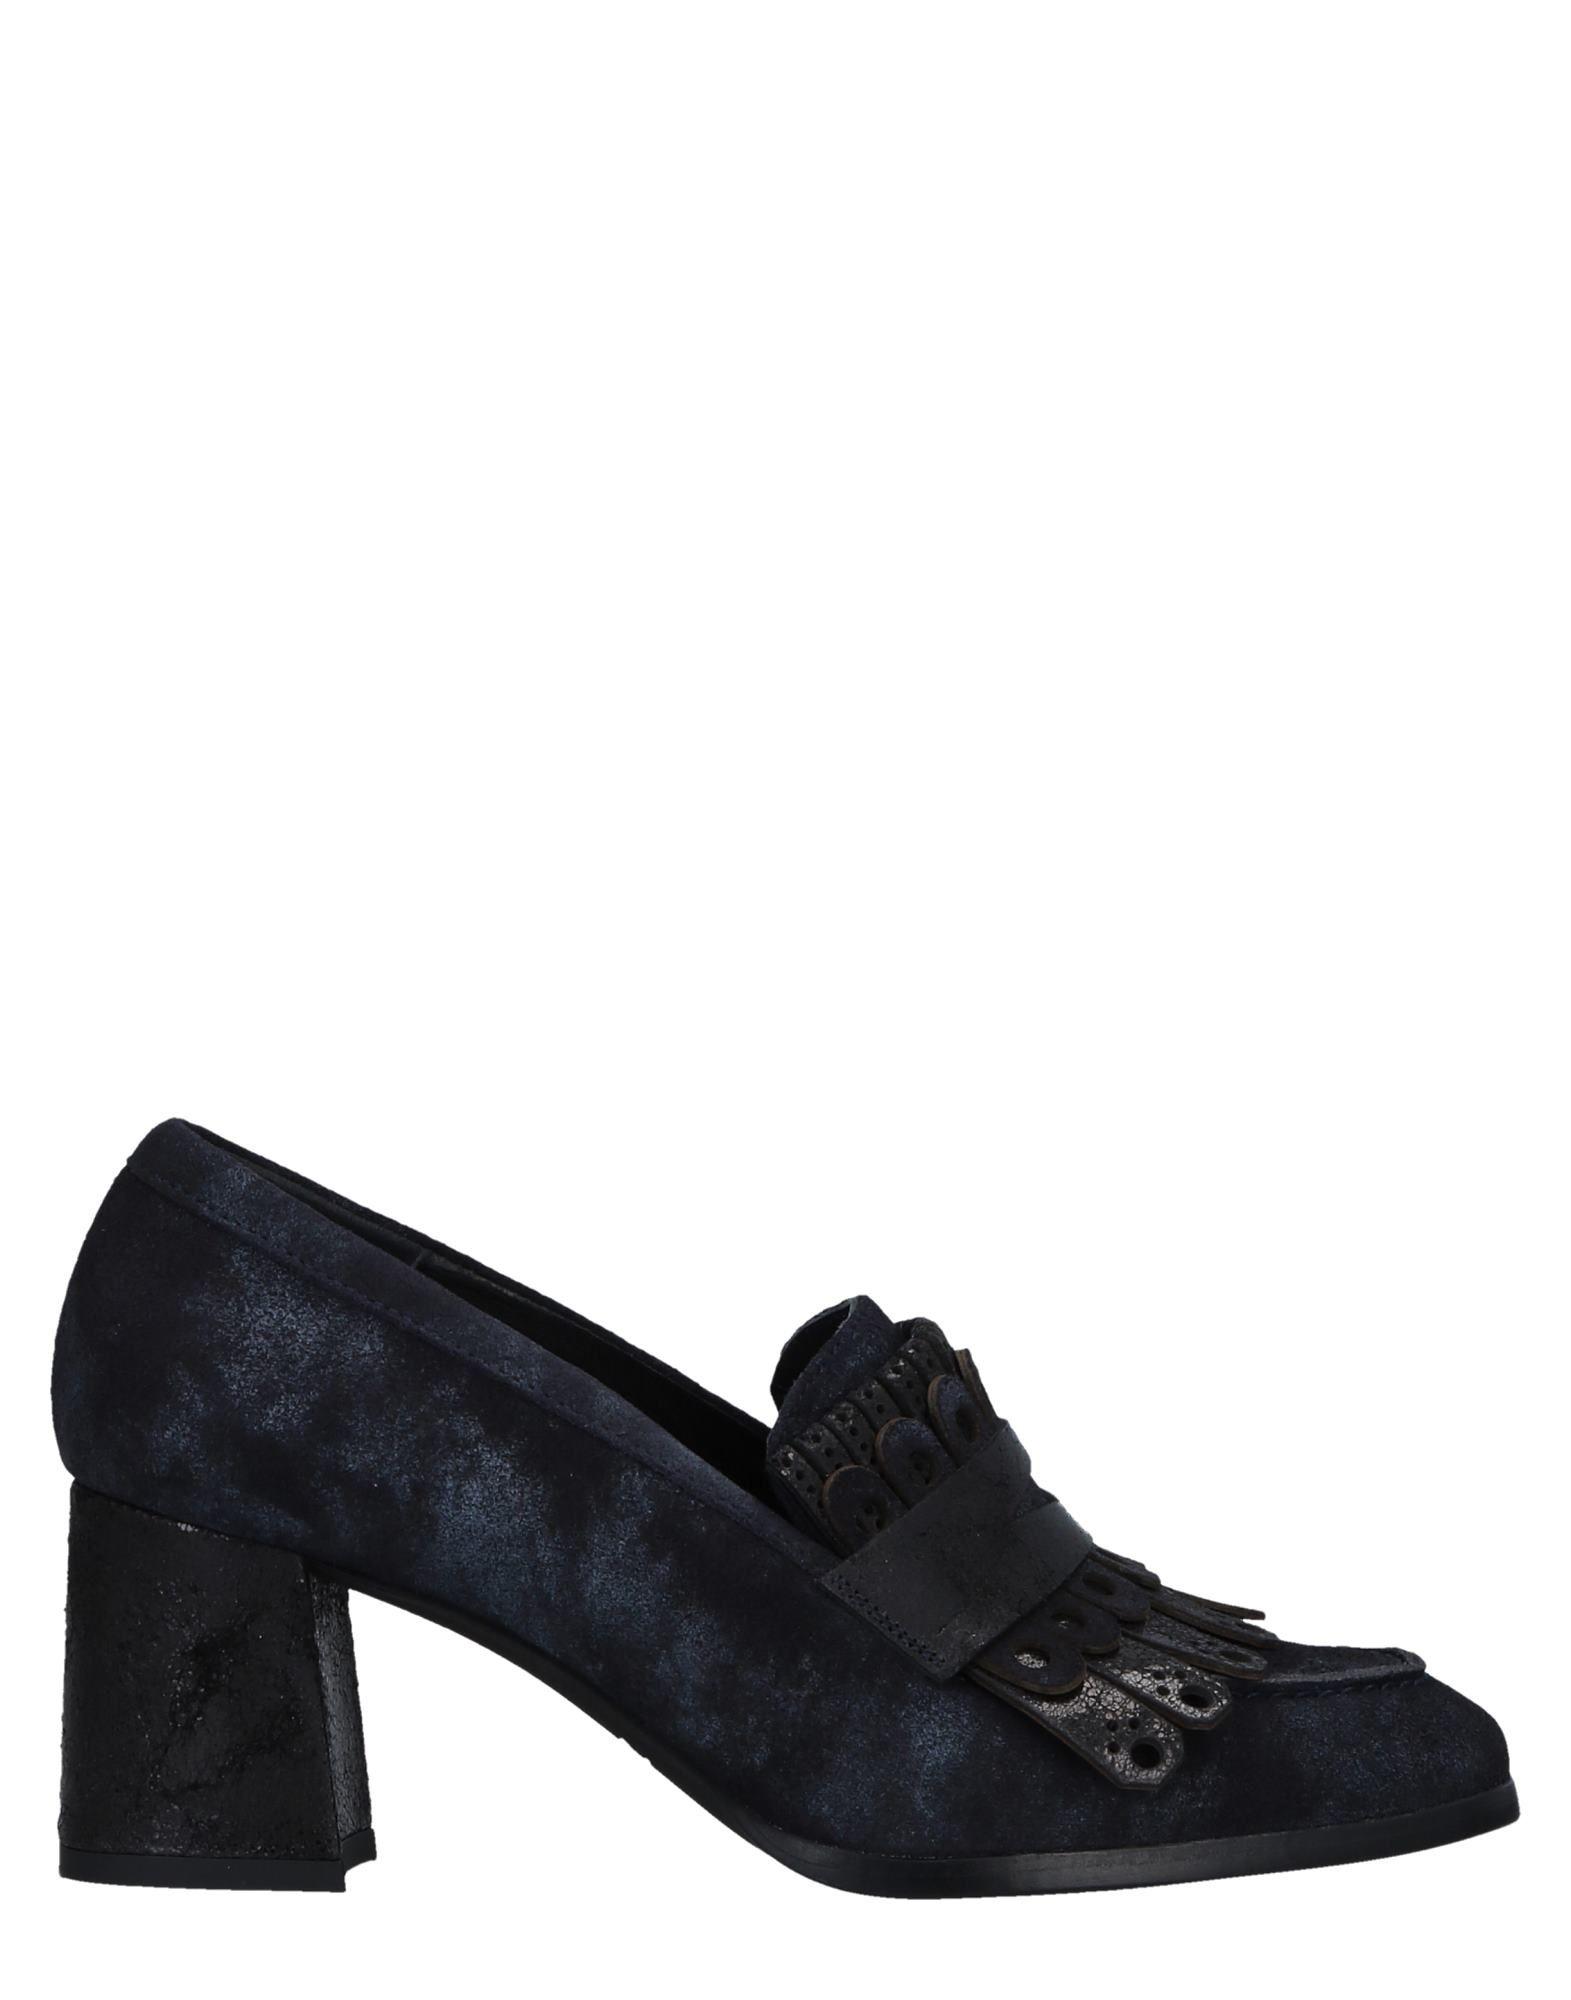 Mocassino Zinda Scarpe Donna - 11518045CB Scarpe Zinda comode e distintive eae7d0